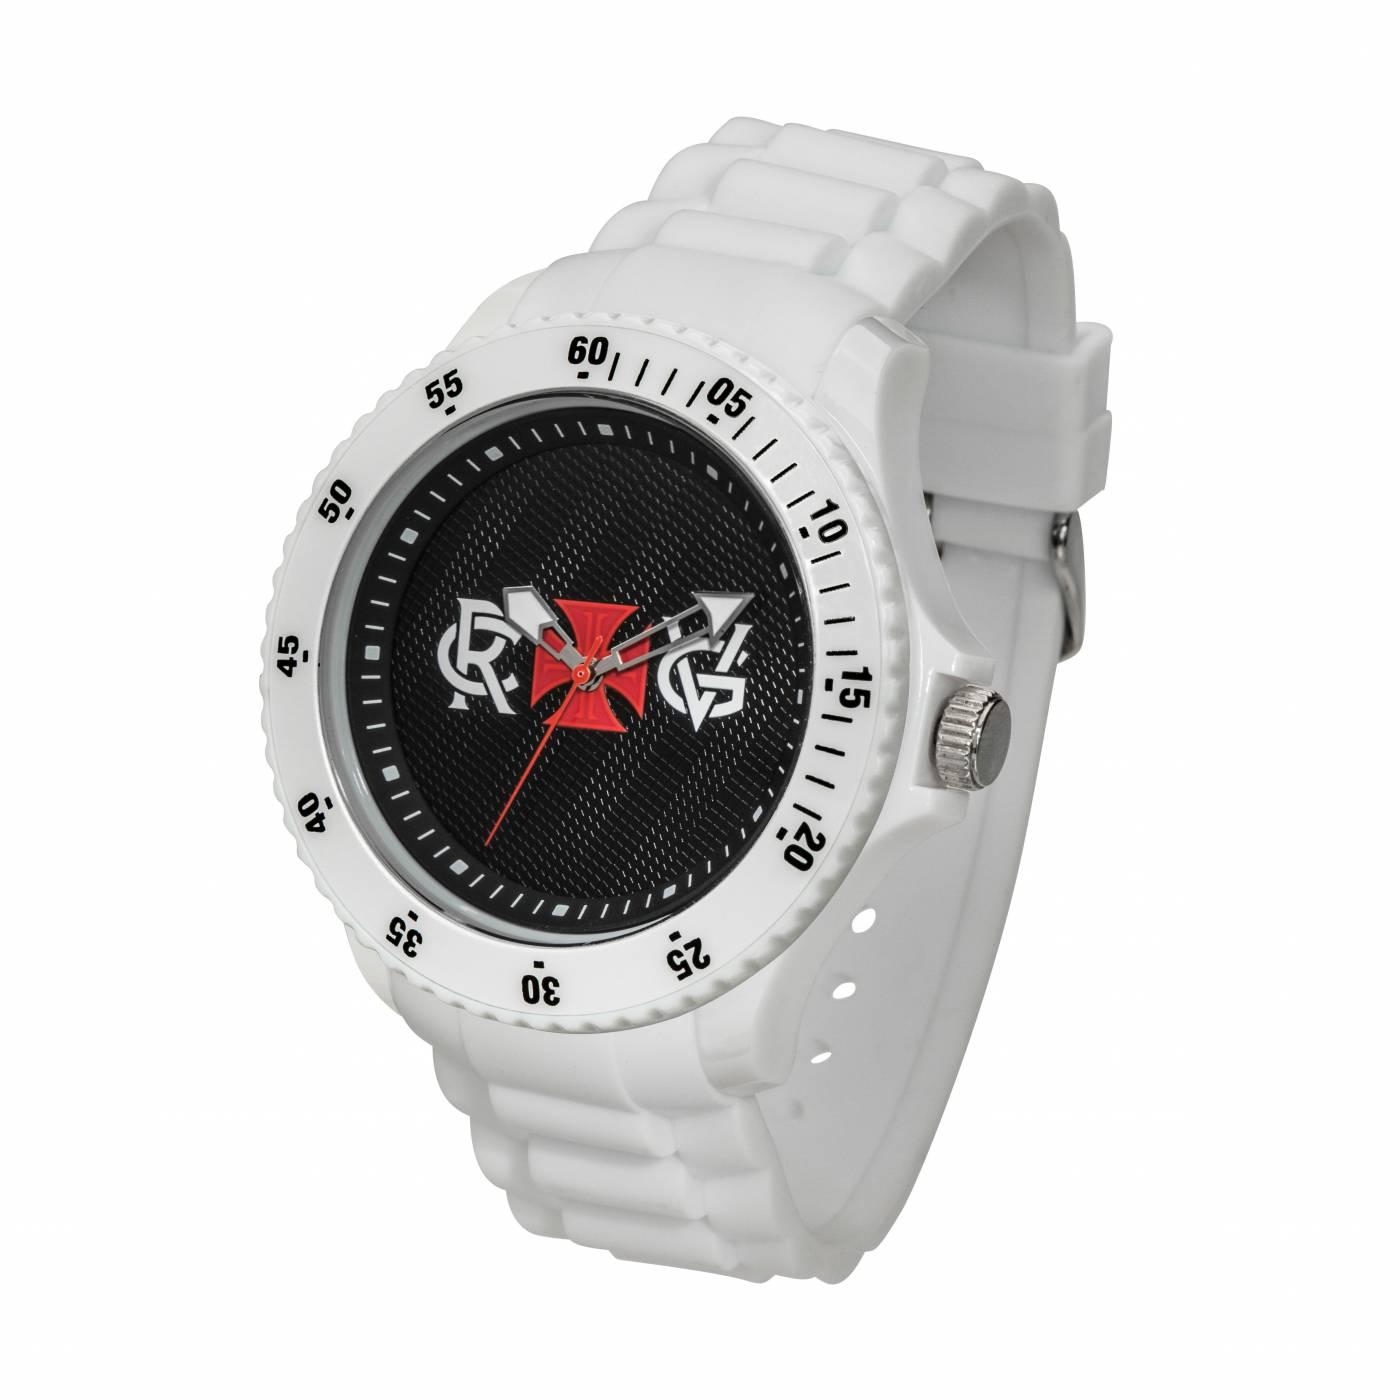 Relógio Vasco CRVG - Branco